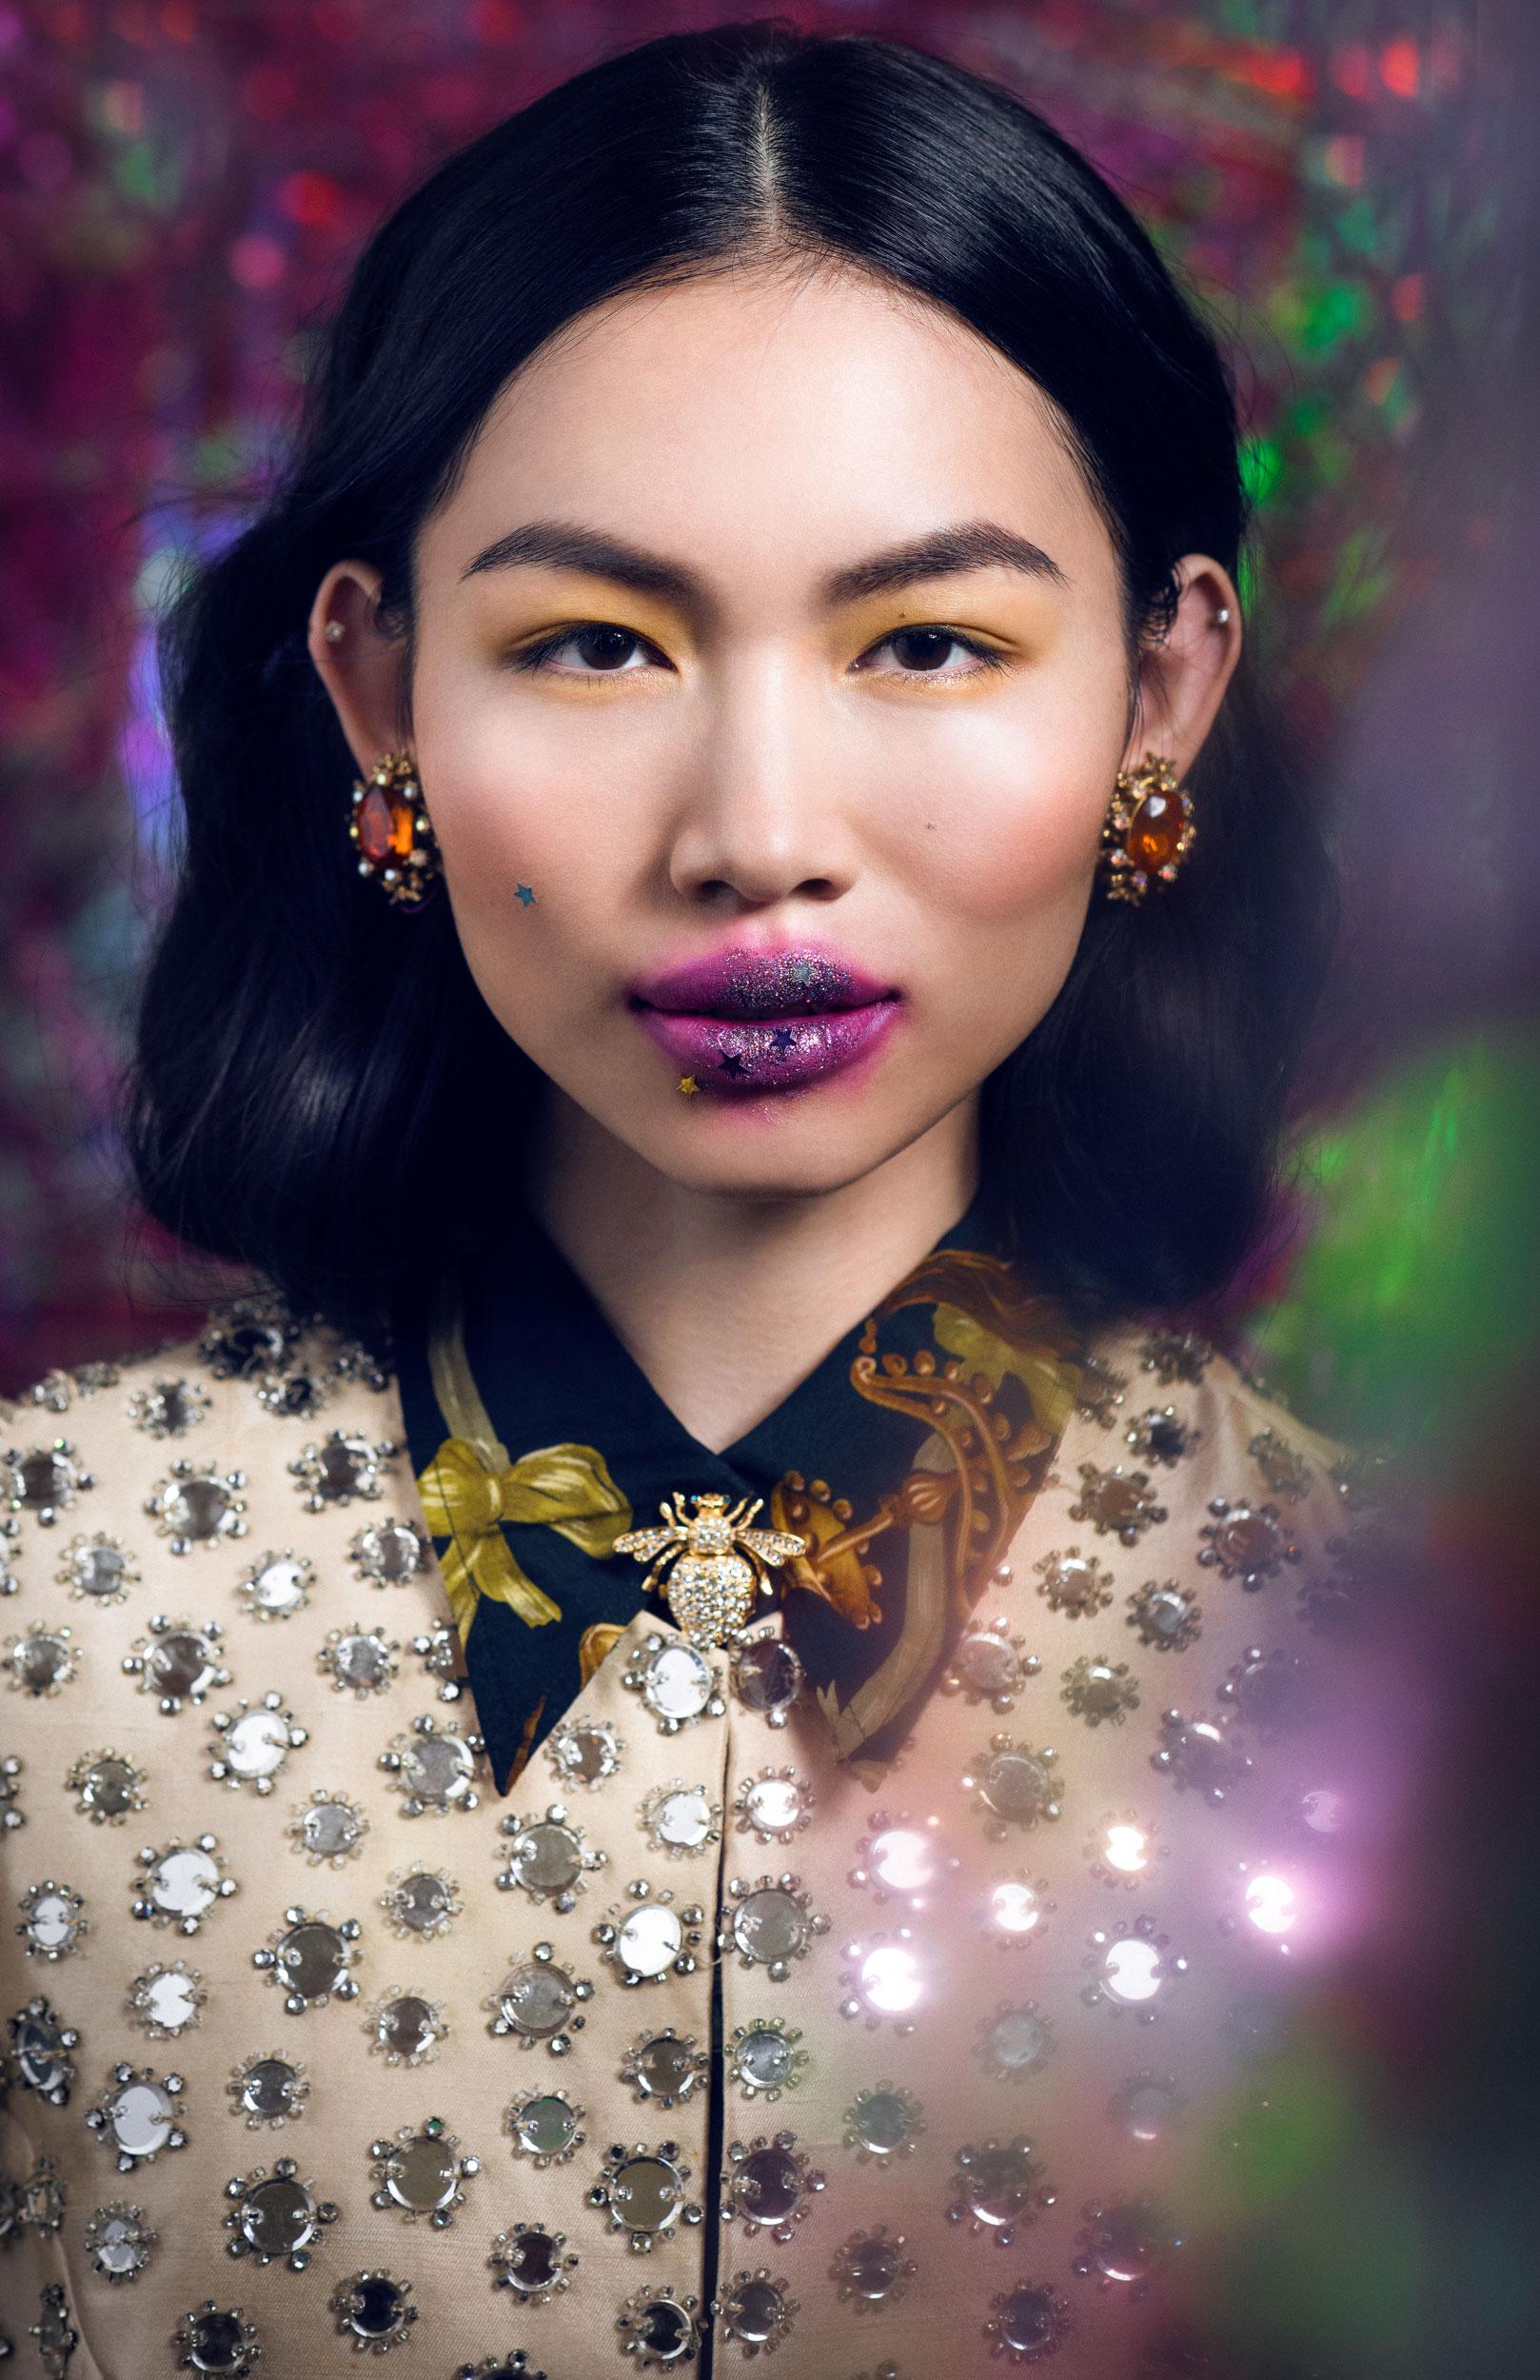 Augusta_Sagnelli_Glitter_Beauty_Editorial-5